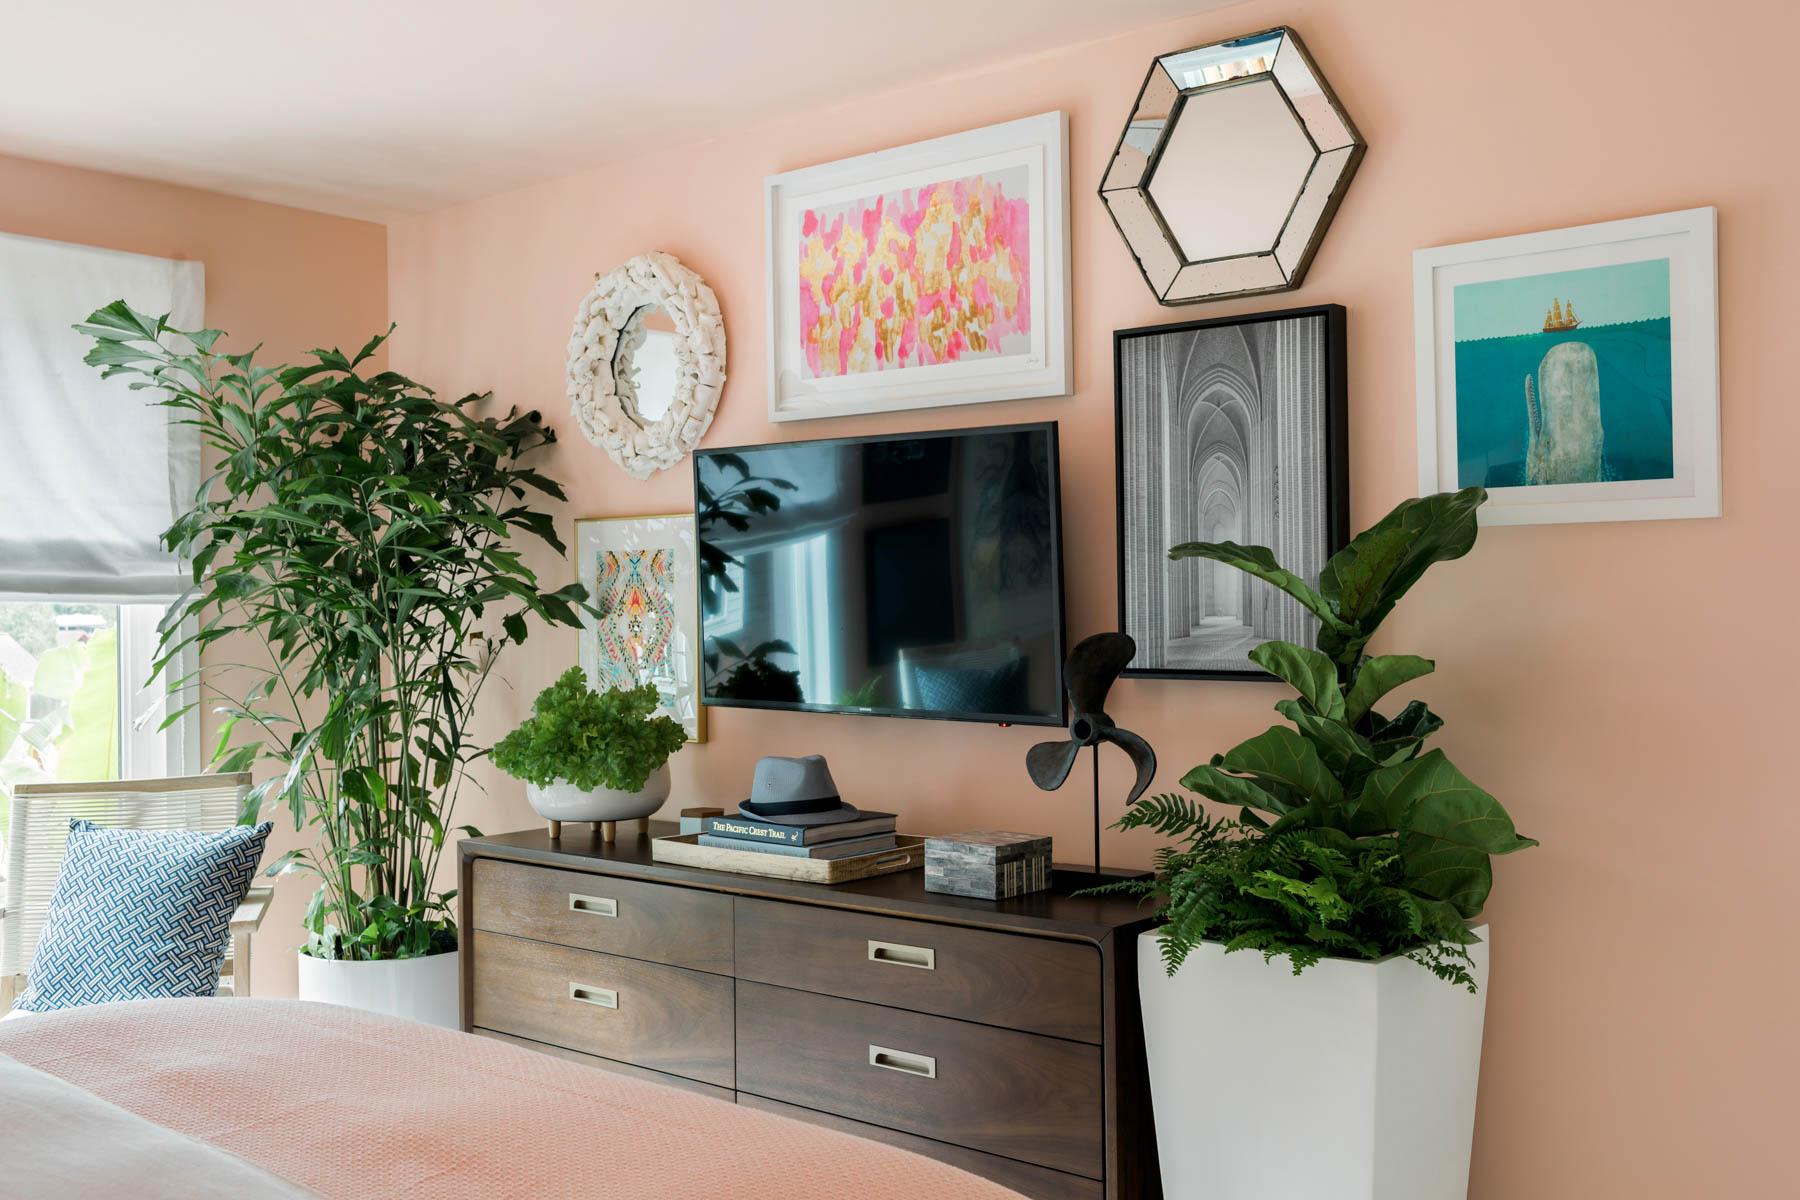 hgtv dream home 2018 tour. Black Bedroom Furniture Sets. Home Design Ideas